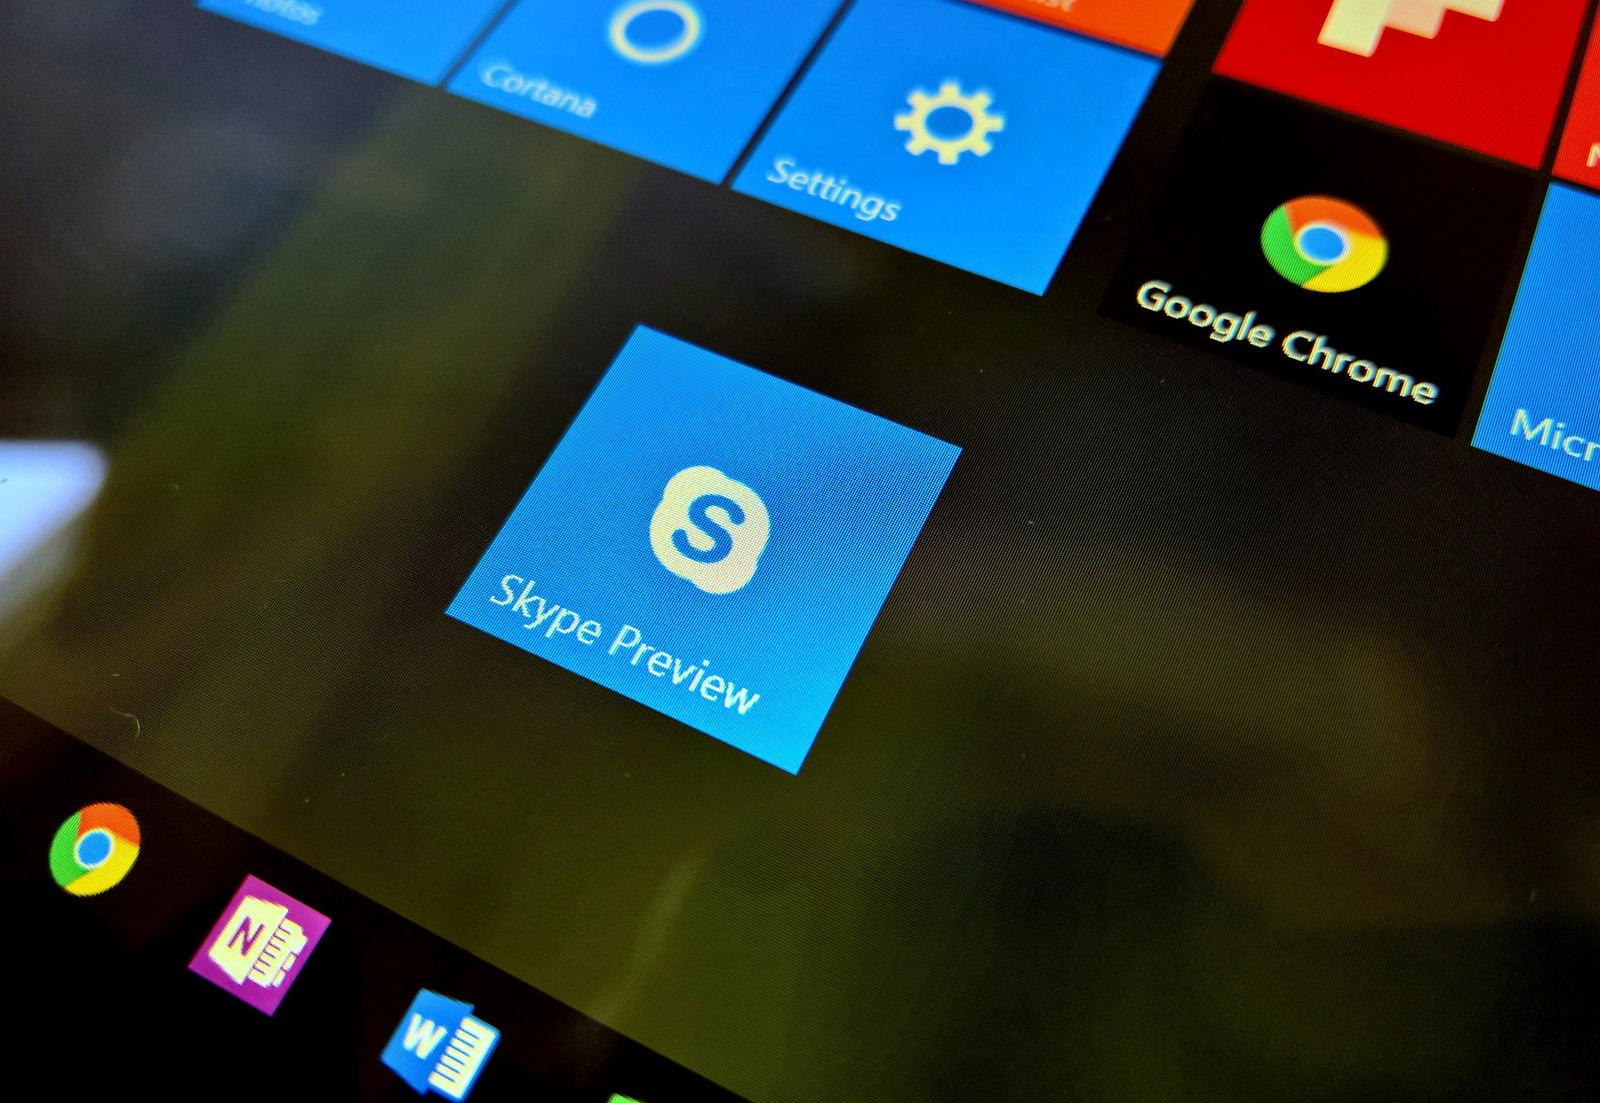 Skype and Microsoft account